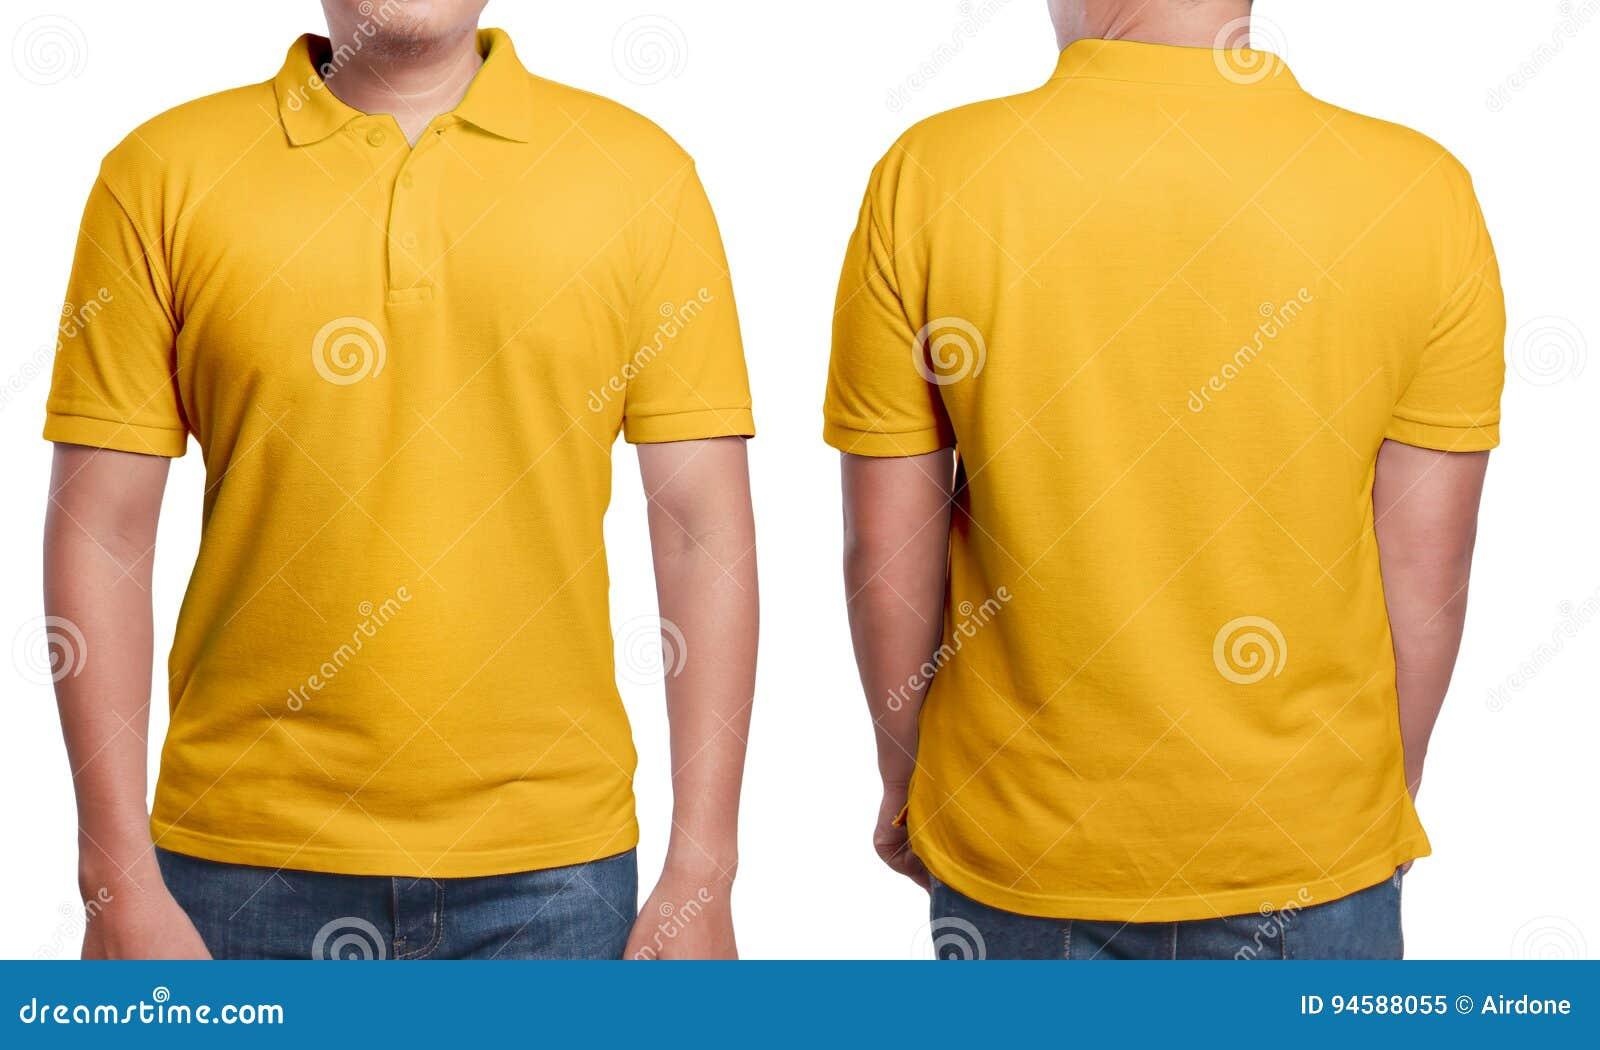 Shirt Design Stock Photo Model